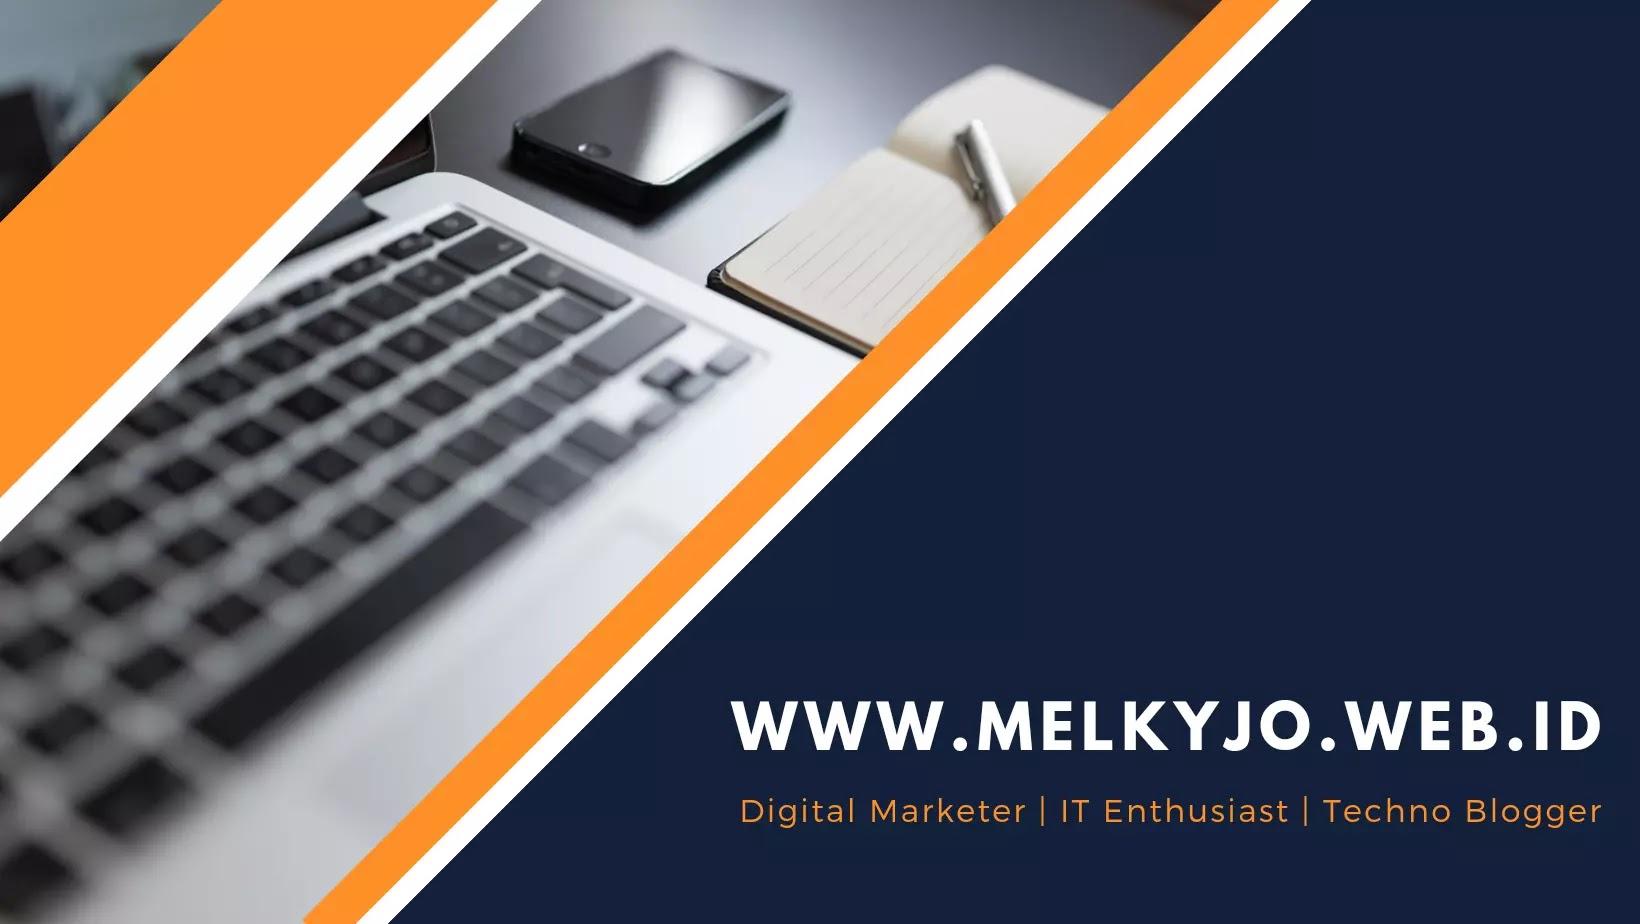 Melky Web ID - Digital Marketer, IT Enthusiast, Techno Blogger